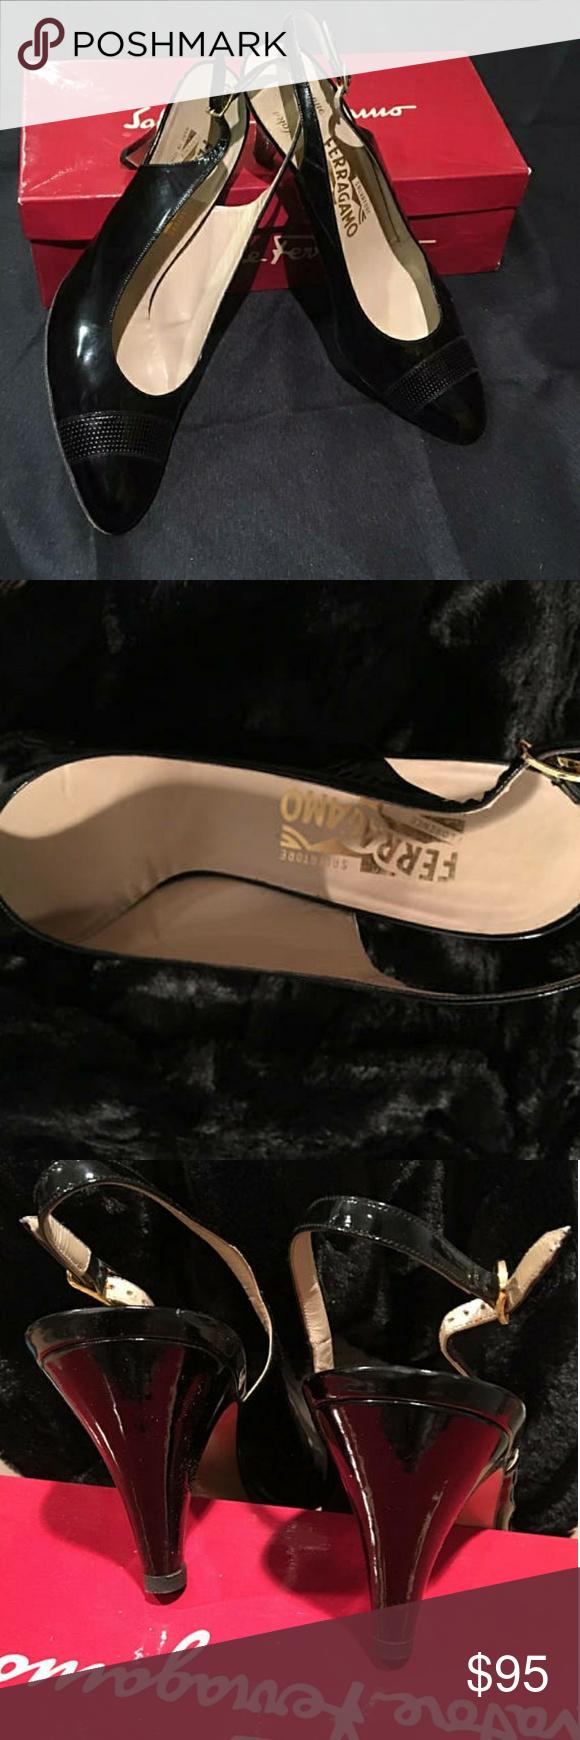 Spotted While Shopping On Poshmark Donald J Pliner Couture Black Slingback Shoes Poshmark Fashion Shopping St In 2020 Slingback Shoes Kitten Heel Shoes Slingback